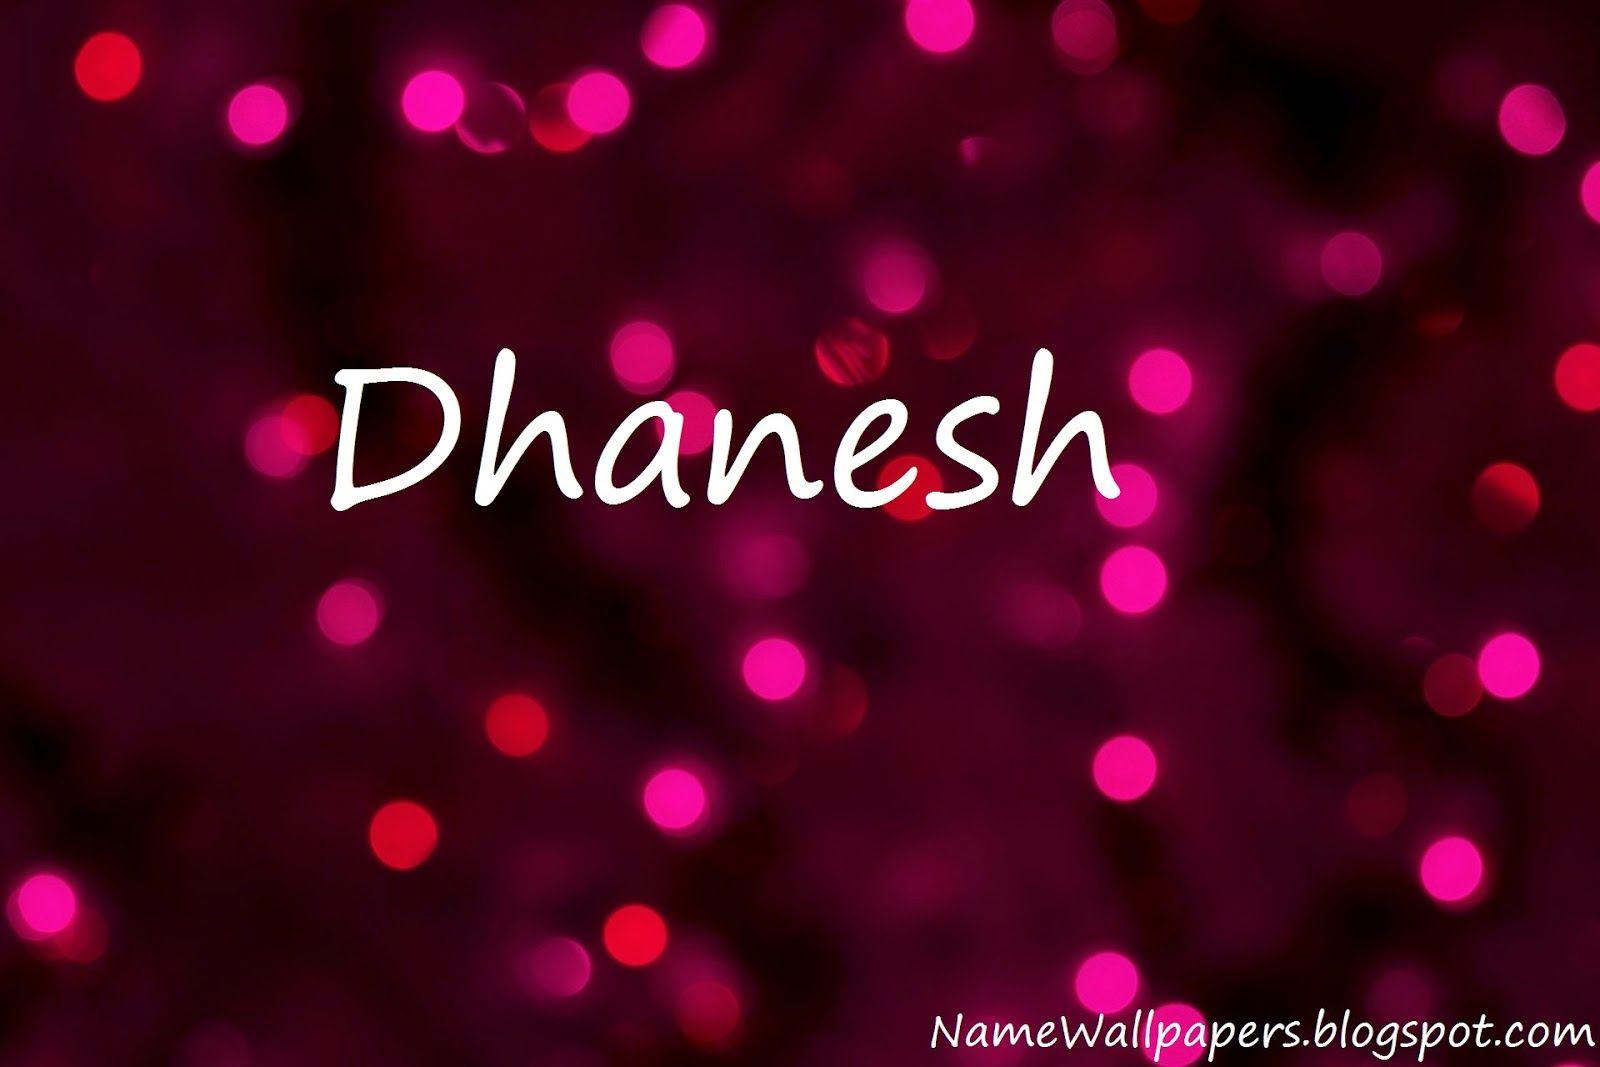 Dhanesh Name Wallpapers Wallpaper Urdu Meaning